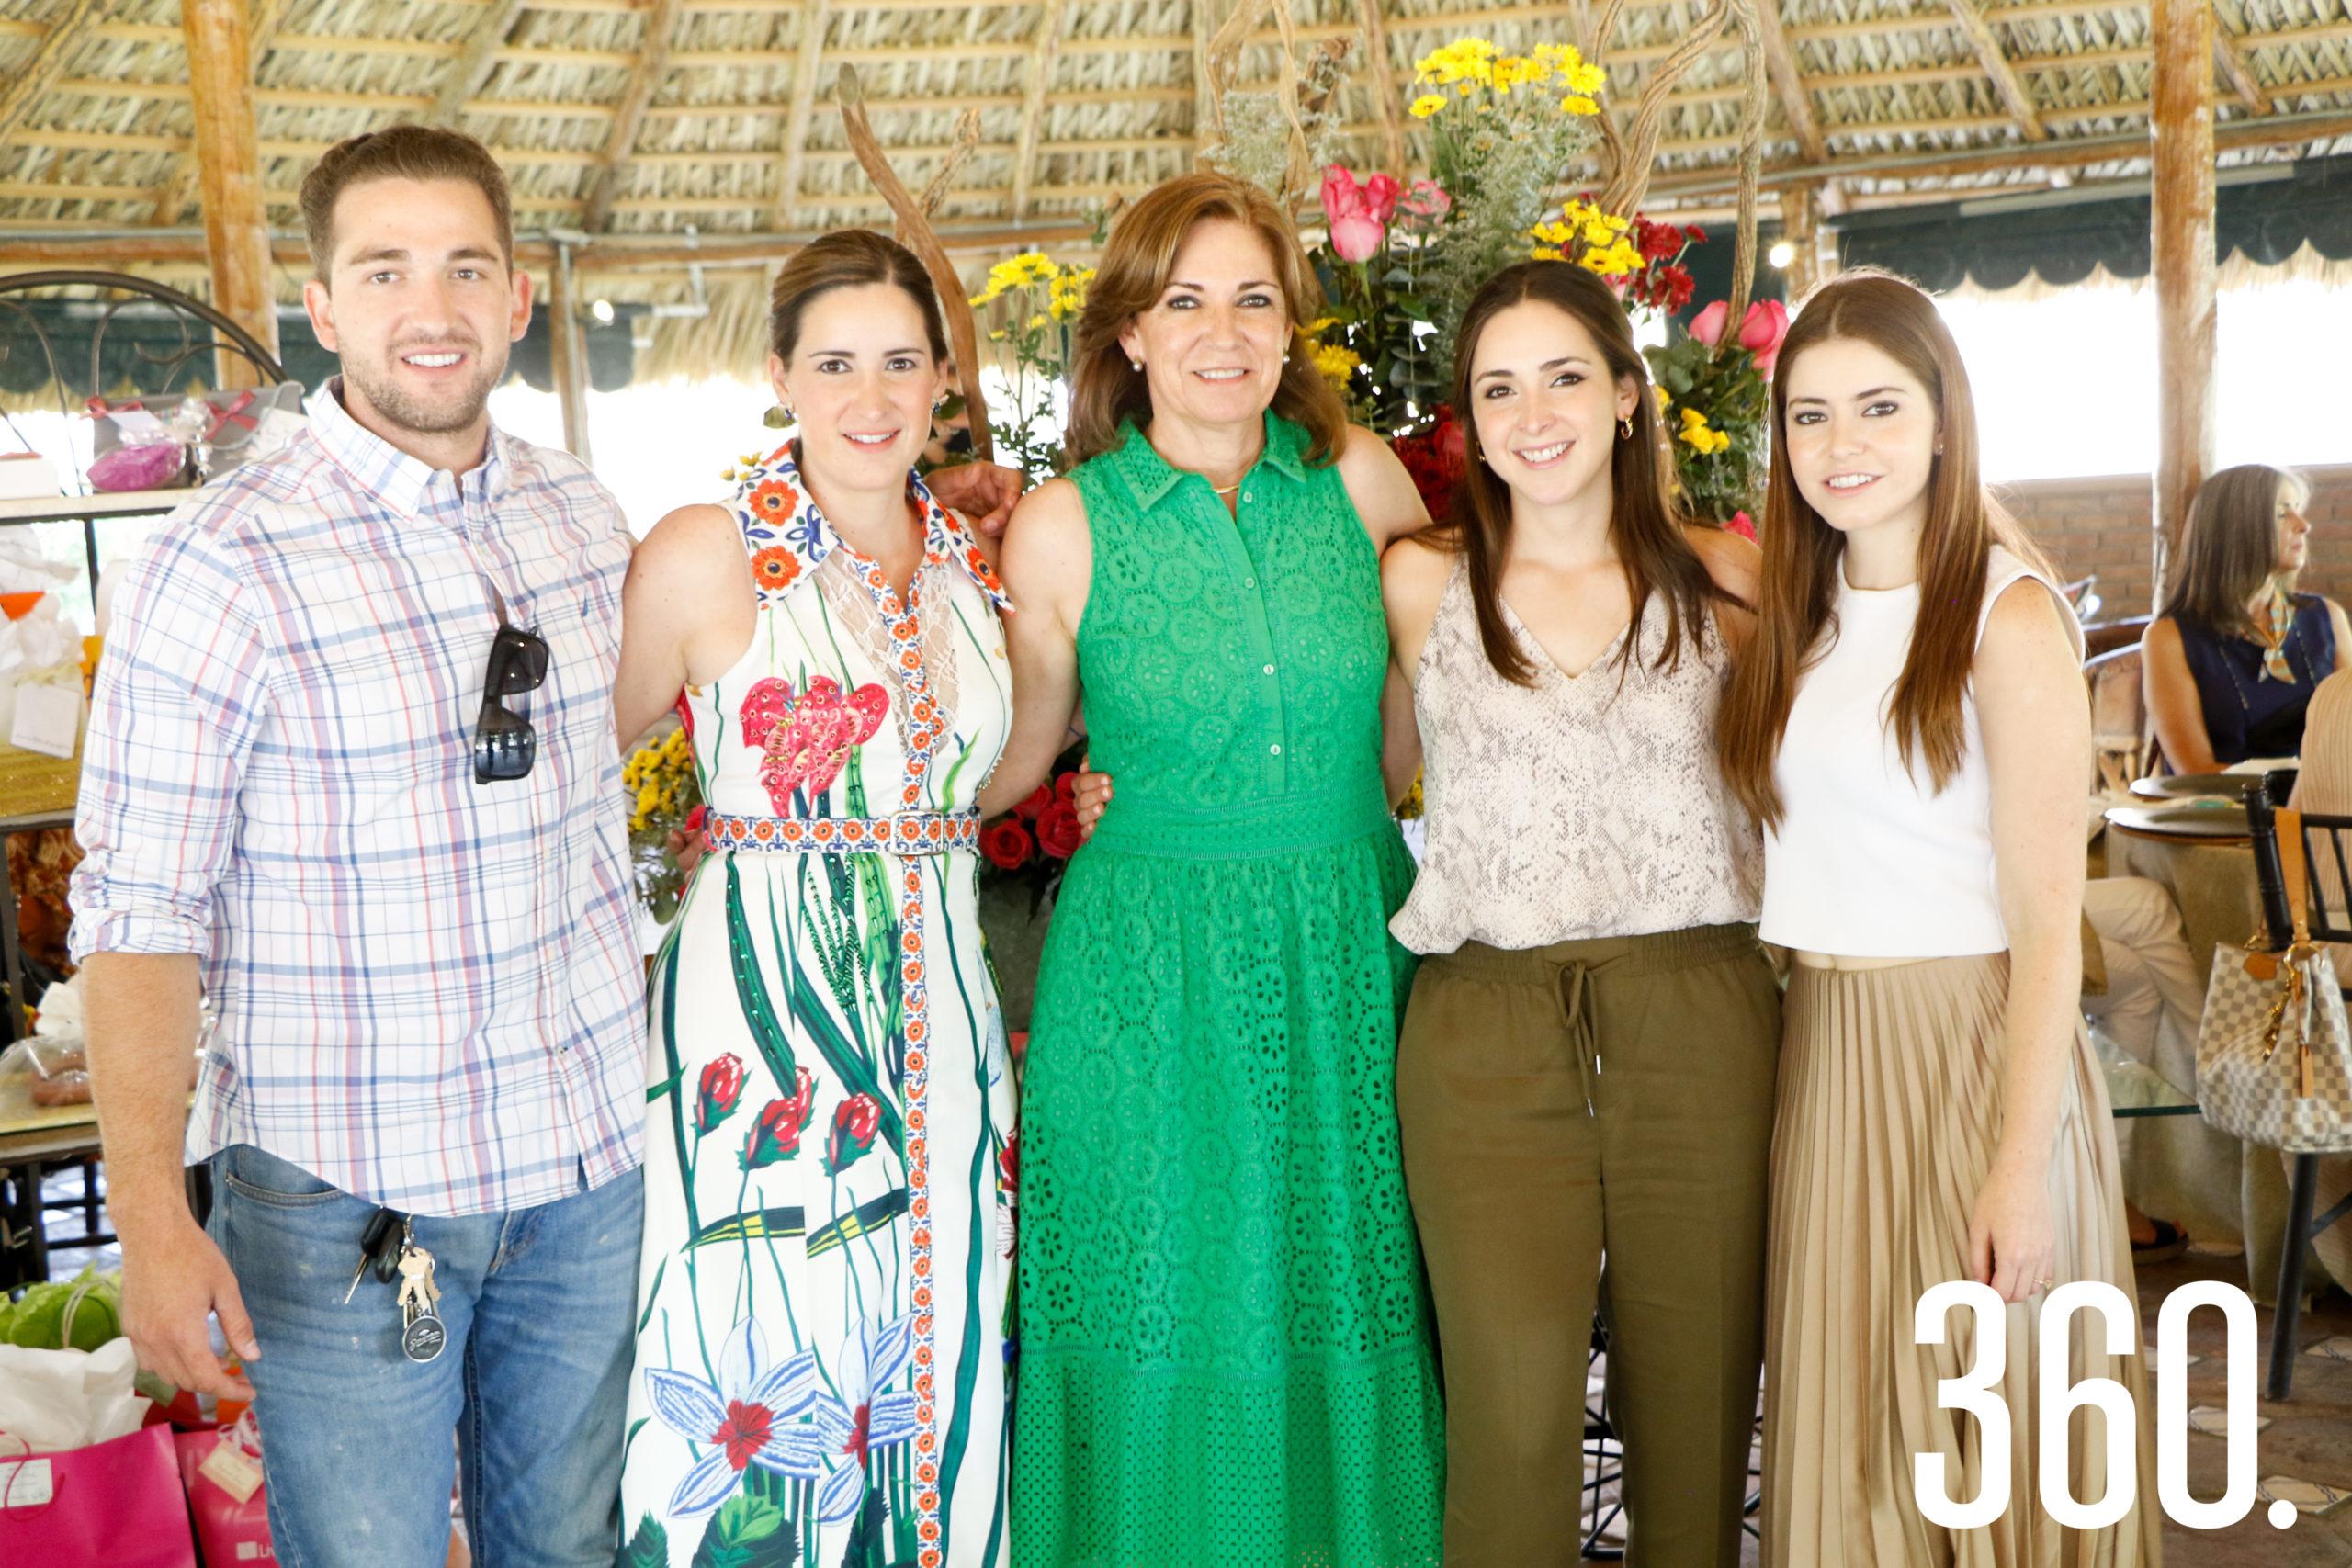 Gloria con sus hijos, Jorge Dávila, Gloria Dávila, Valeria Dávila y María Inés Dávila.